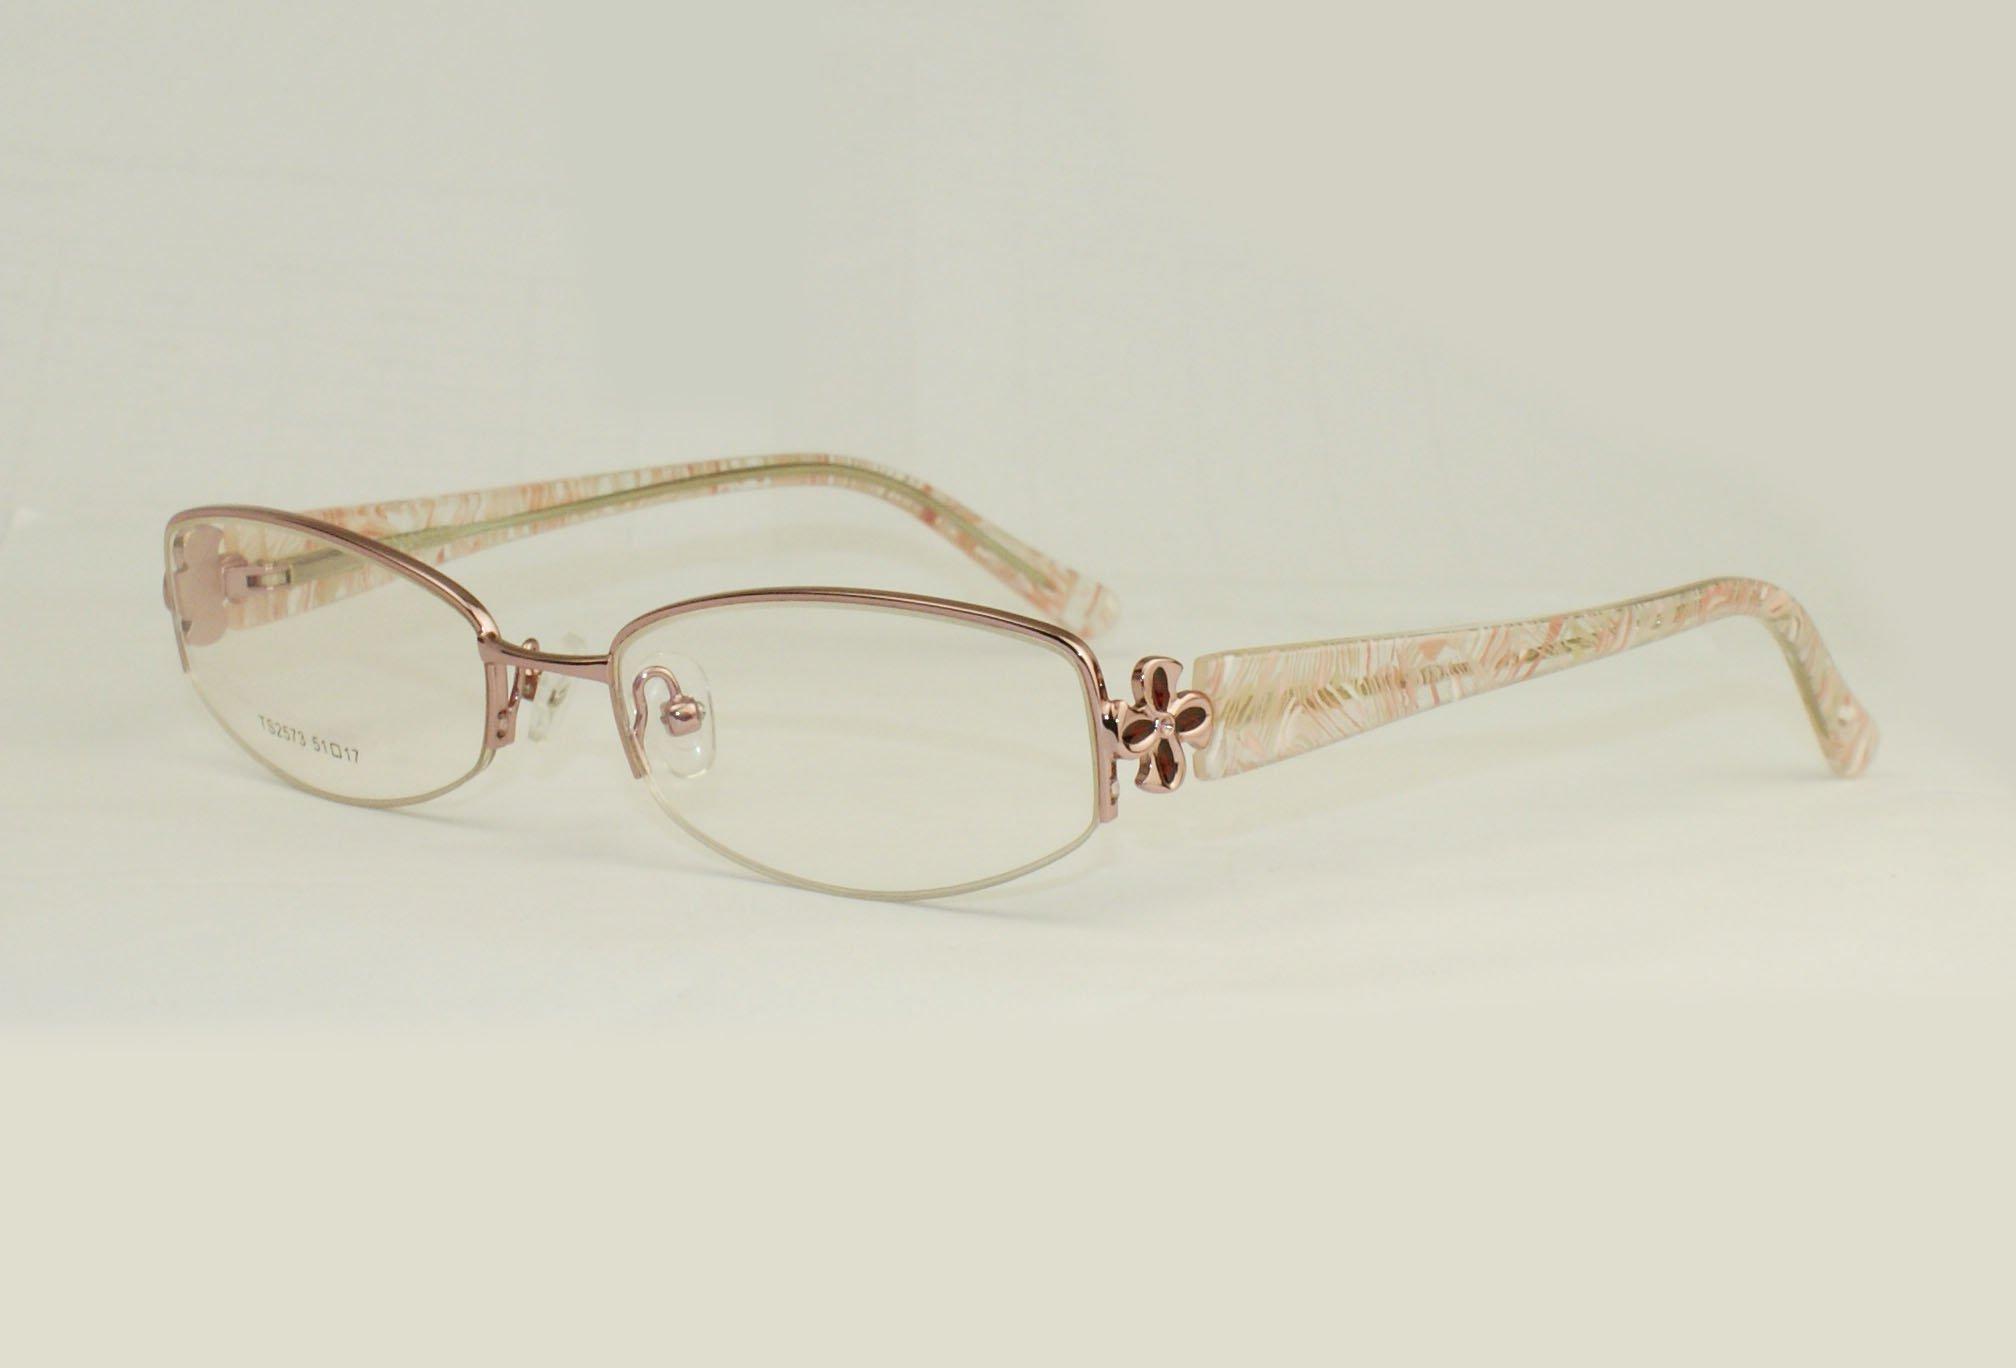 0e834f14c4d8 Designer Eyeglass Frames